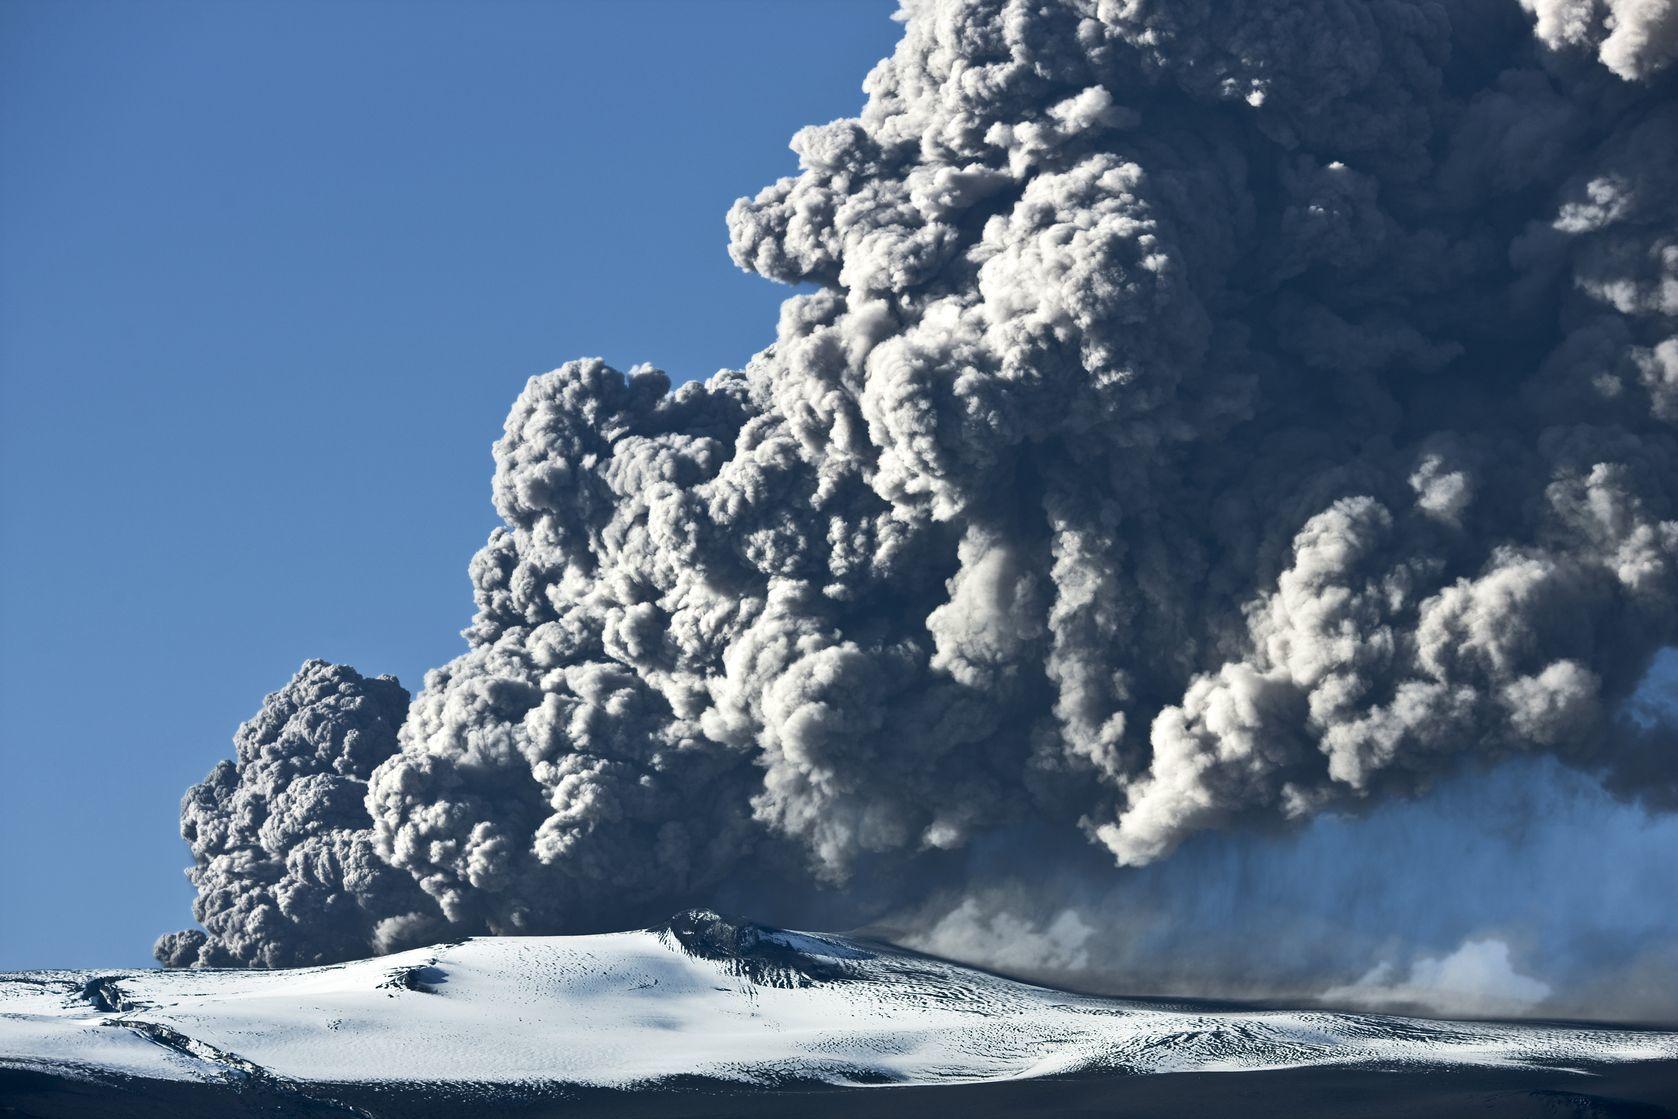 Sopečná erupce na Islandu | klikk/123RF.com